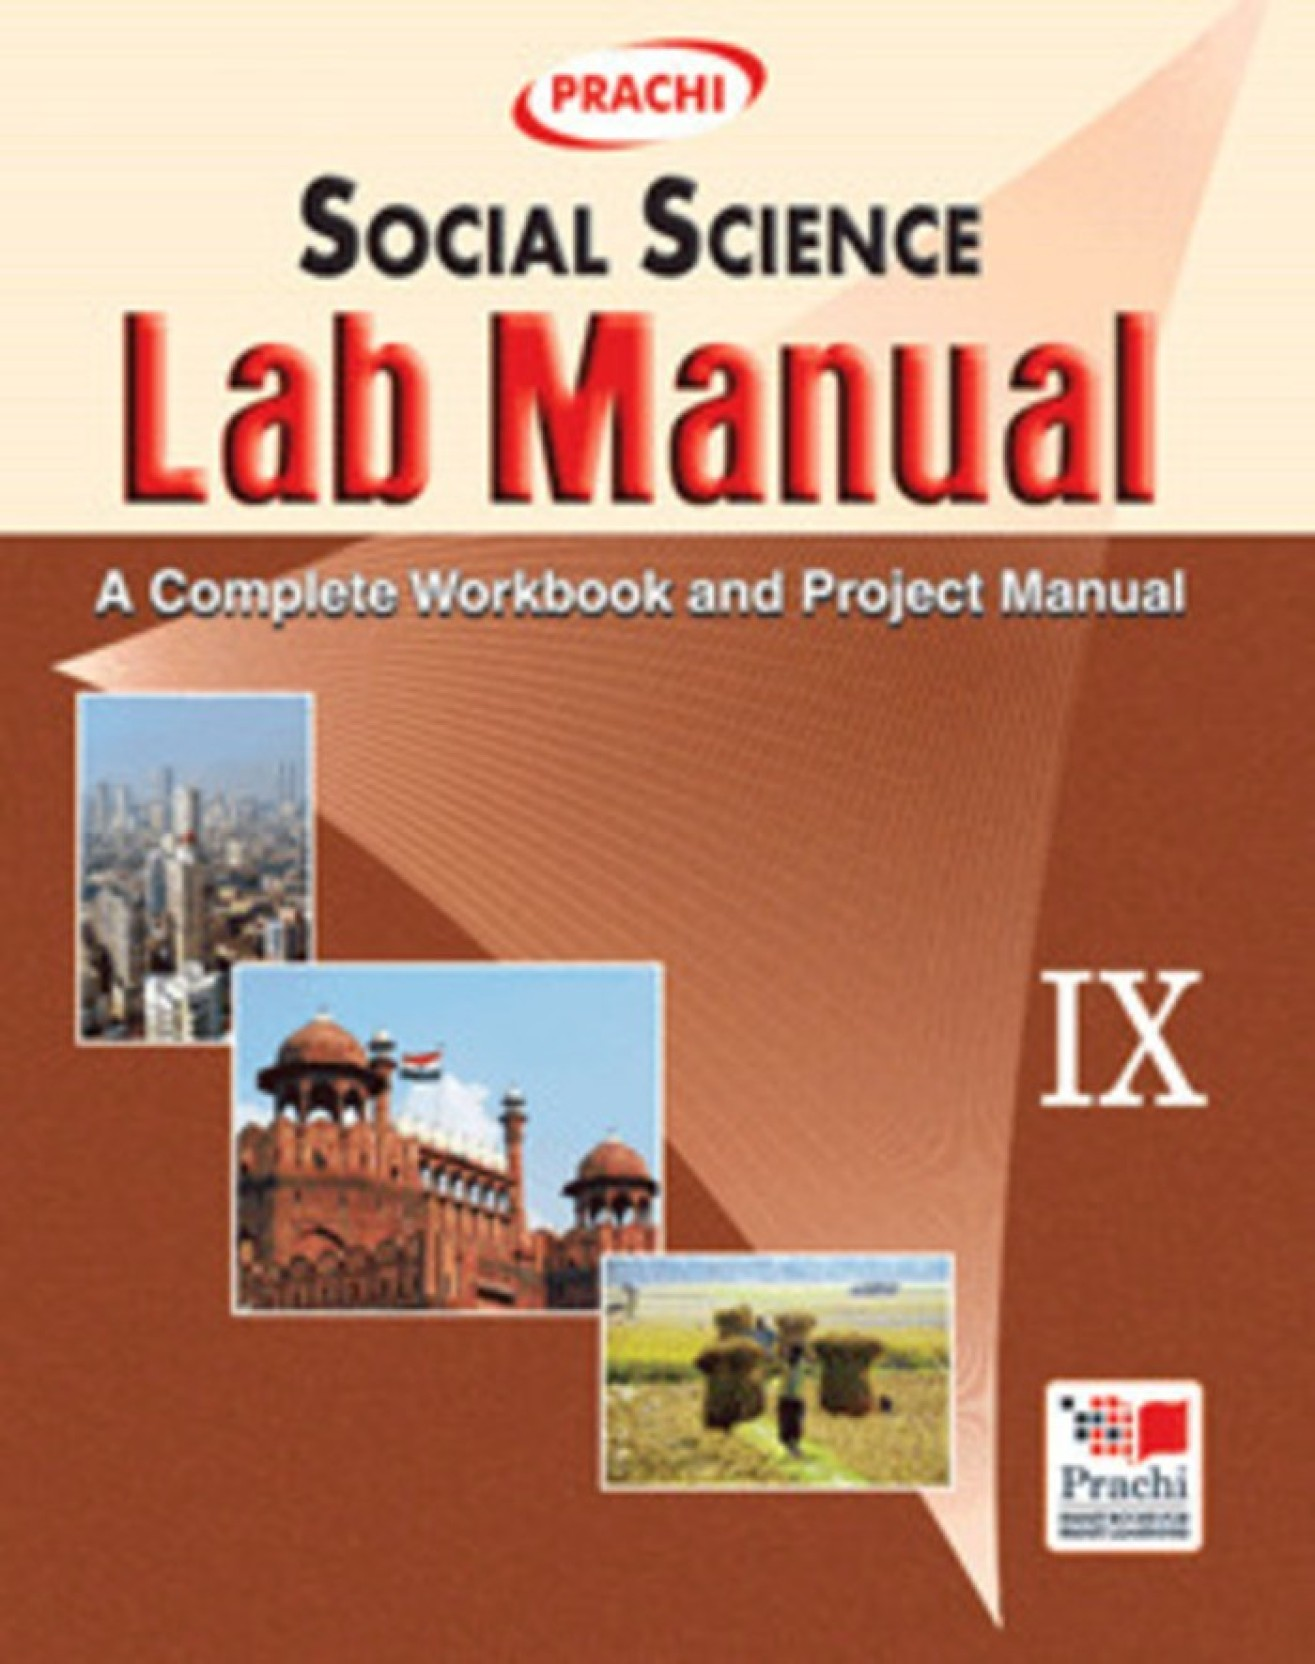 SOCIAL SCIENCE LAB MANUAL CLASS-IX. ADD TO CART